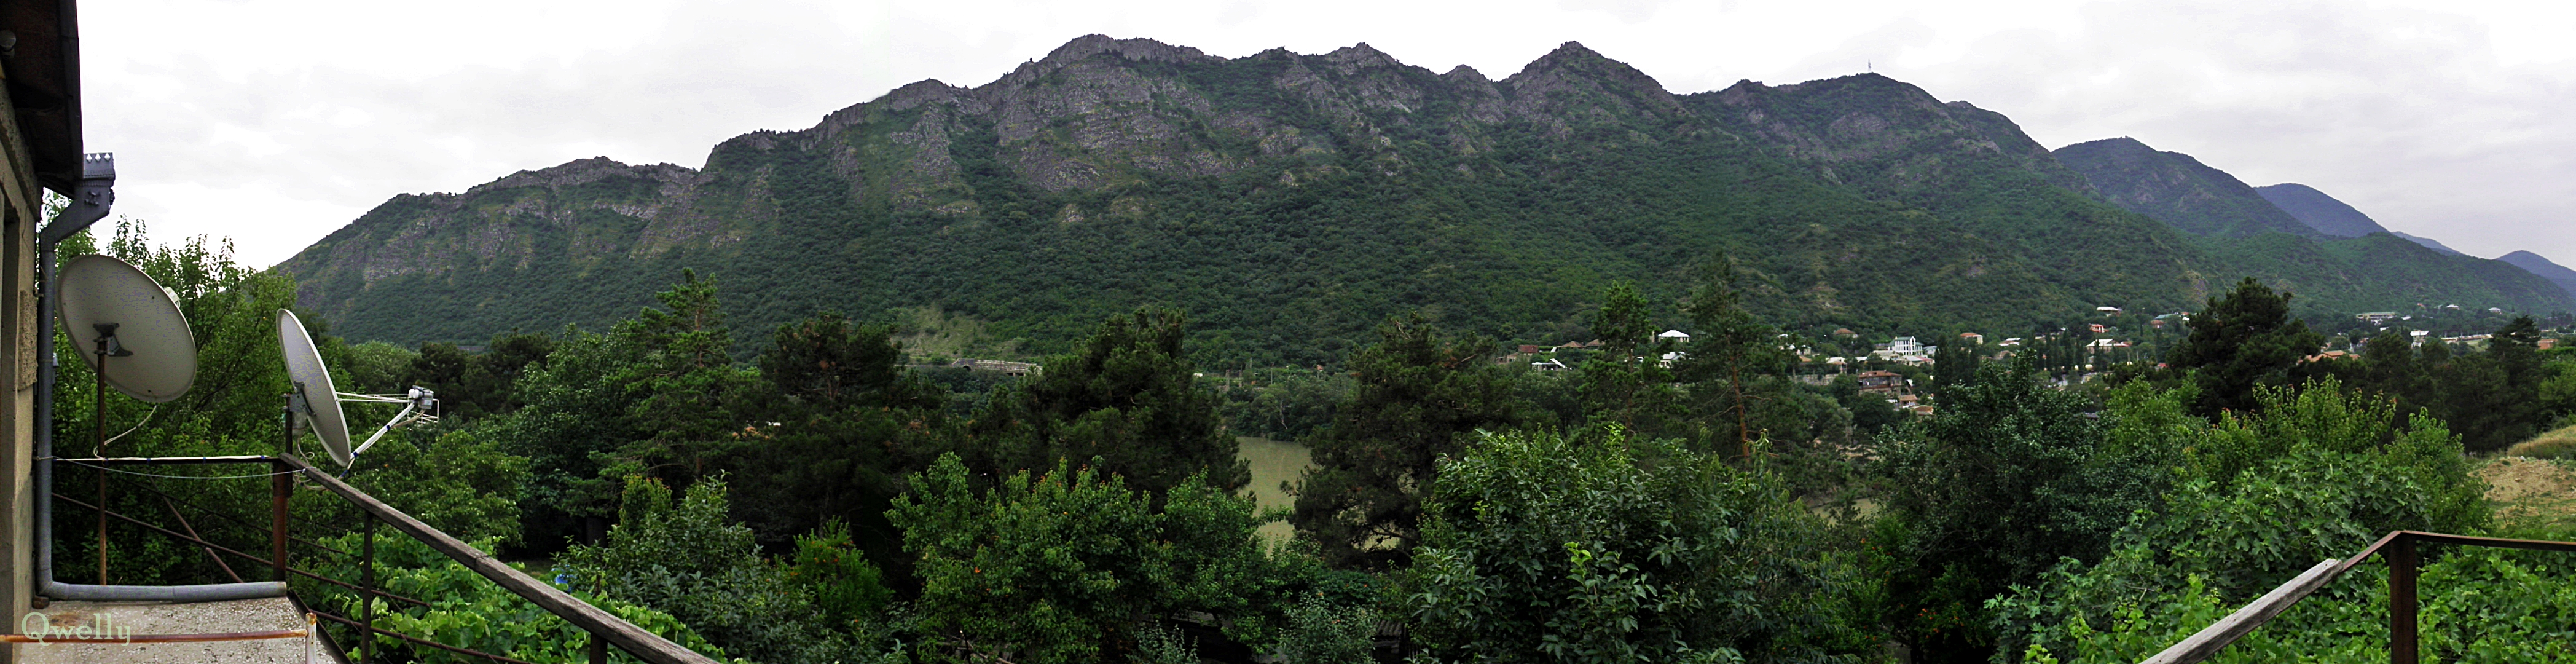 green, mountains, mtskheta, panorama, photography, qwelly, qwellygraphy, trialeti, აივანი, თრიალეთი, თრიალეთის ქედის მცხეთის მთები, მთები, მცხეთა, ოლიმპუსი, პანორამა, ფოტო, ფოტოგრაფია, ქველი, ქველიგრაფია